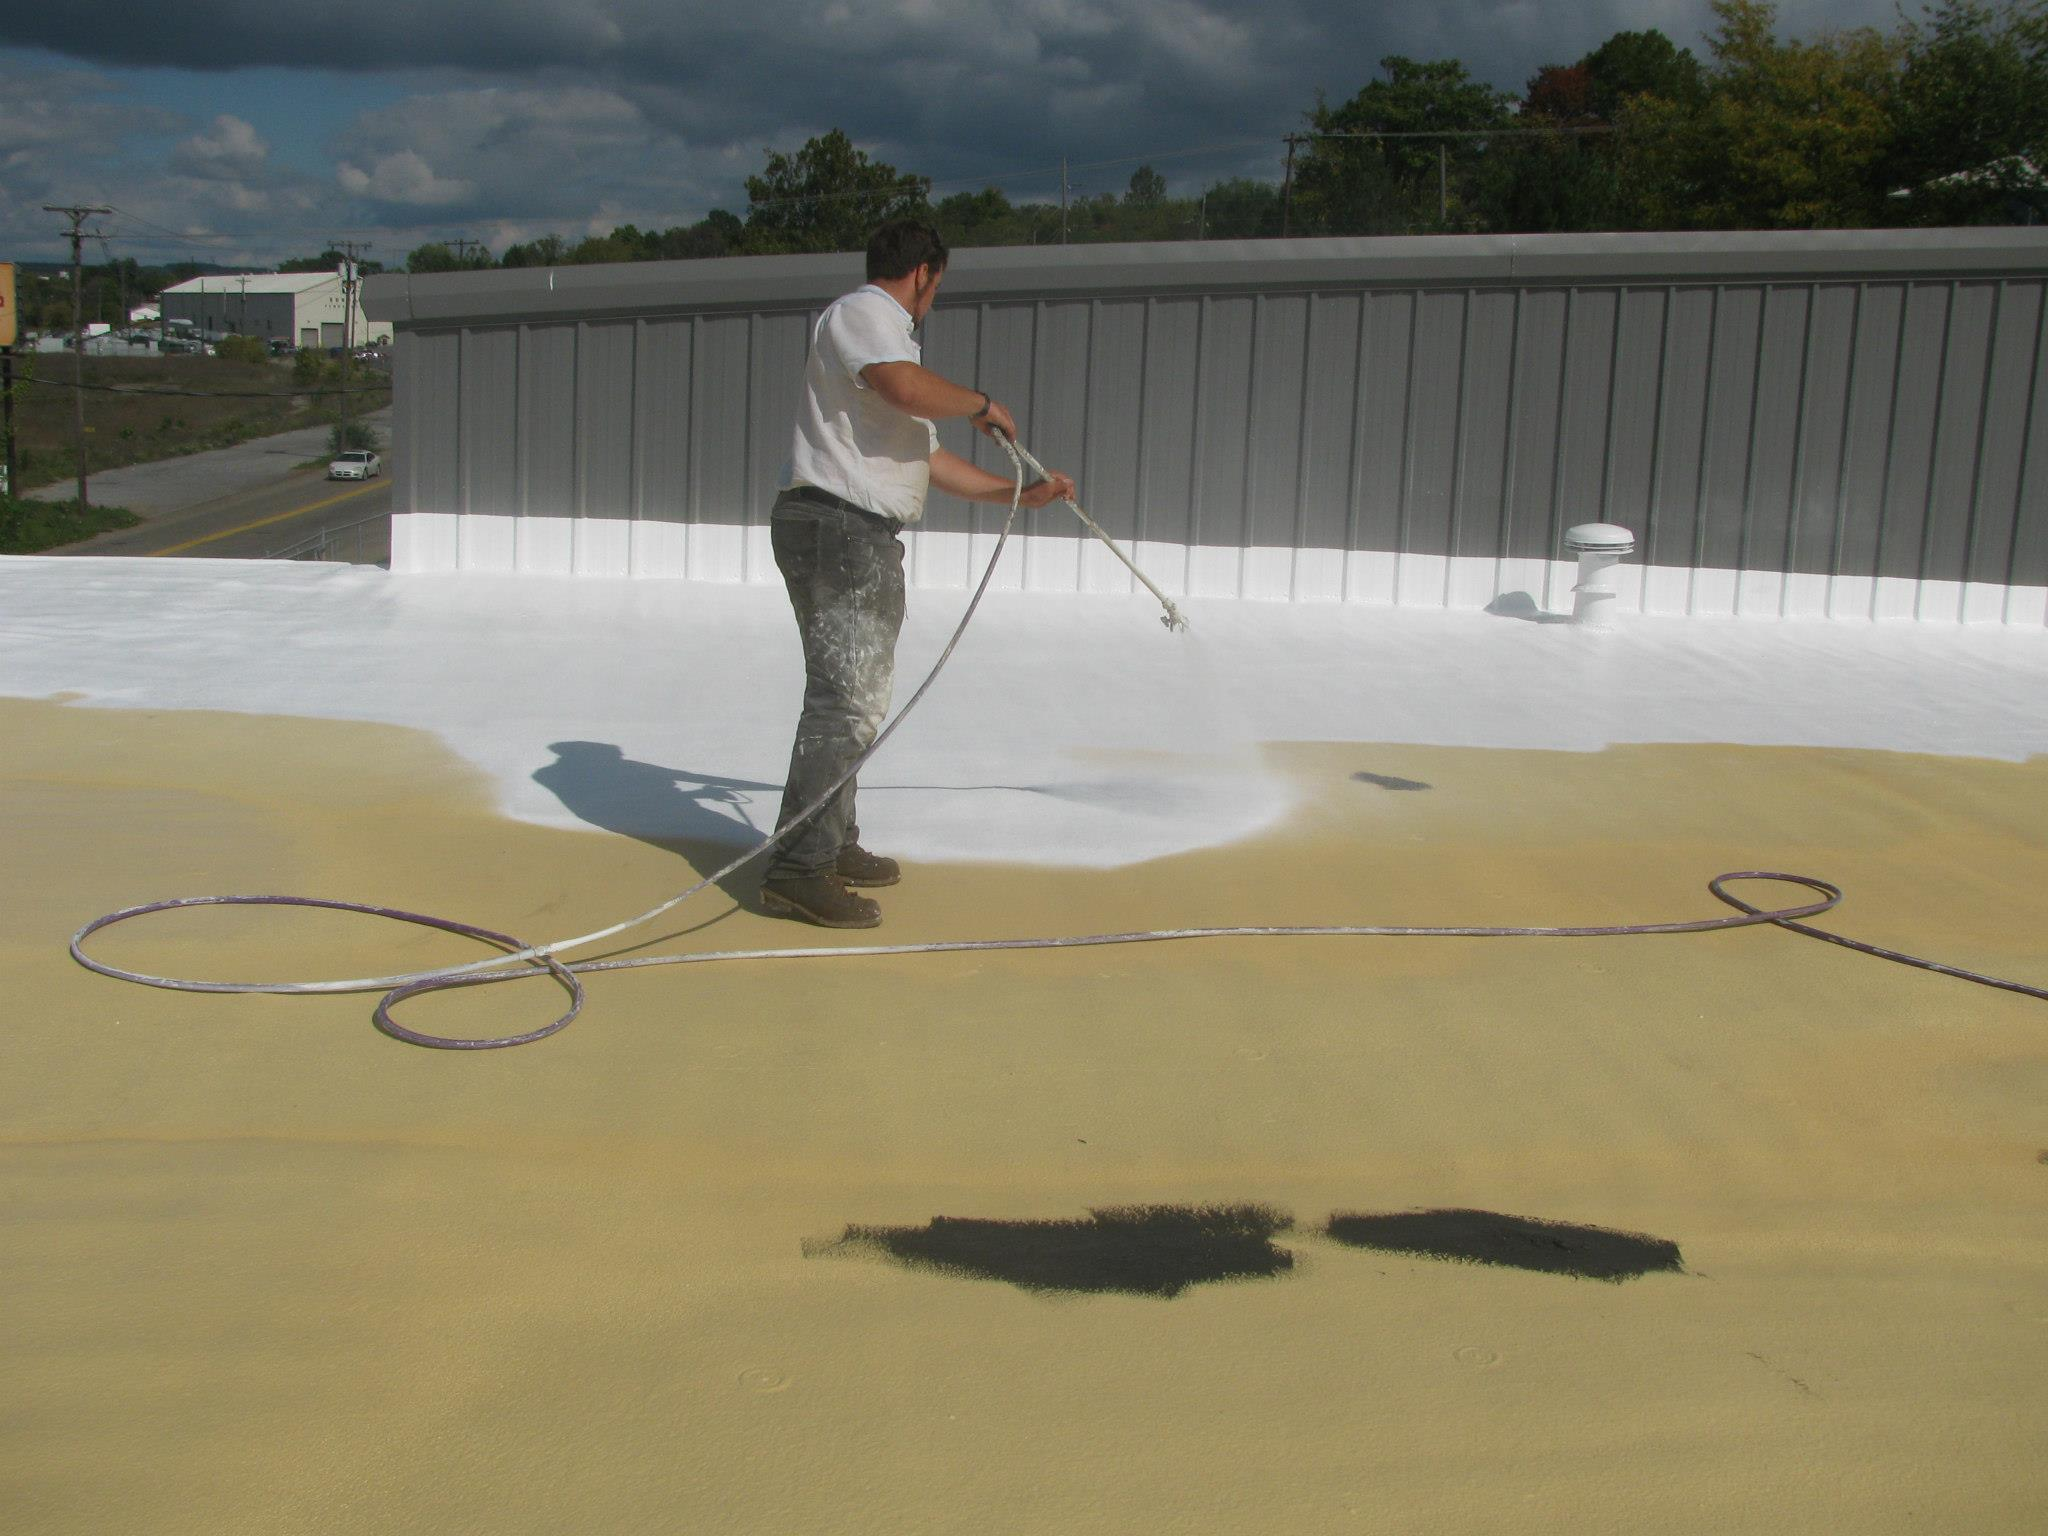 Spray foam roofing being applied.